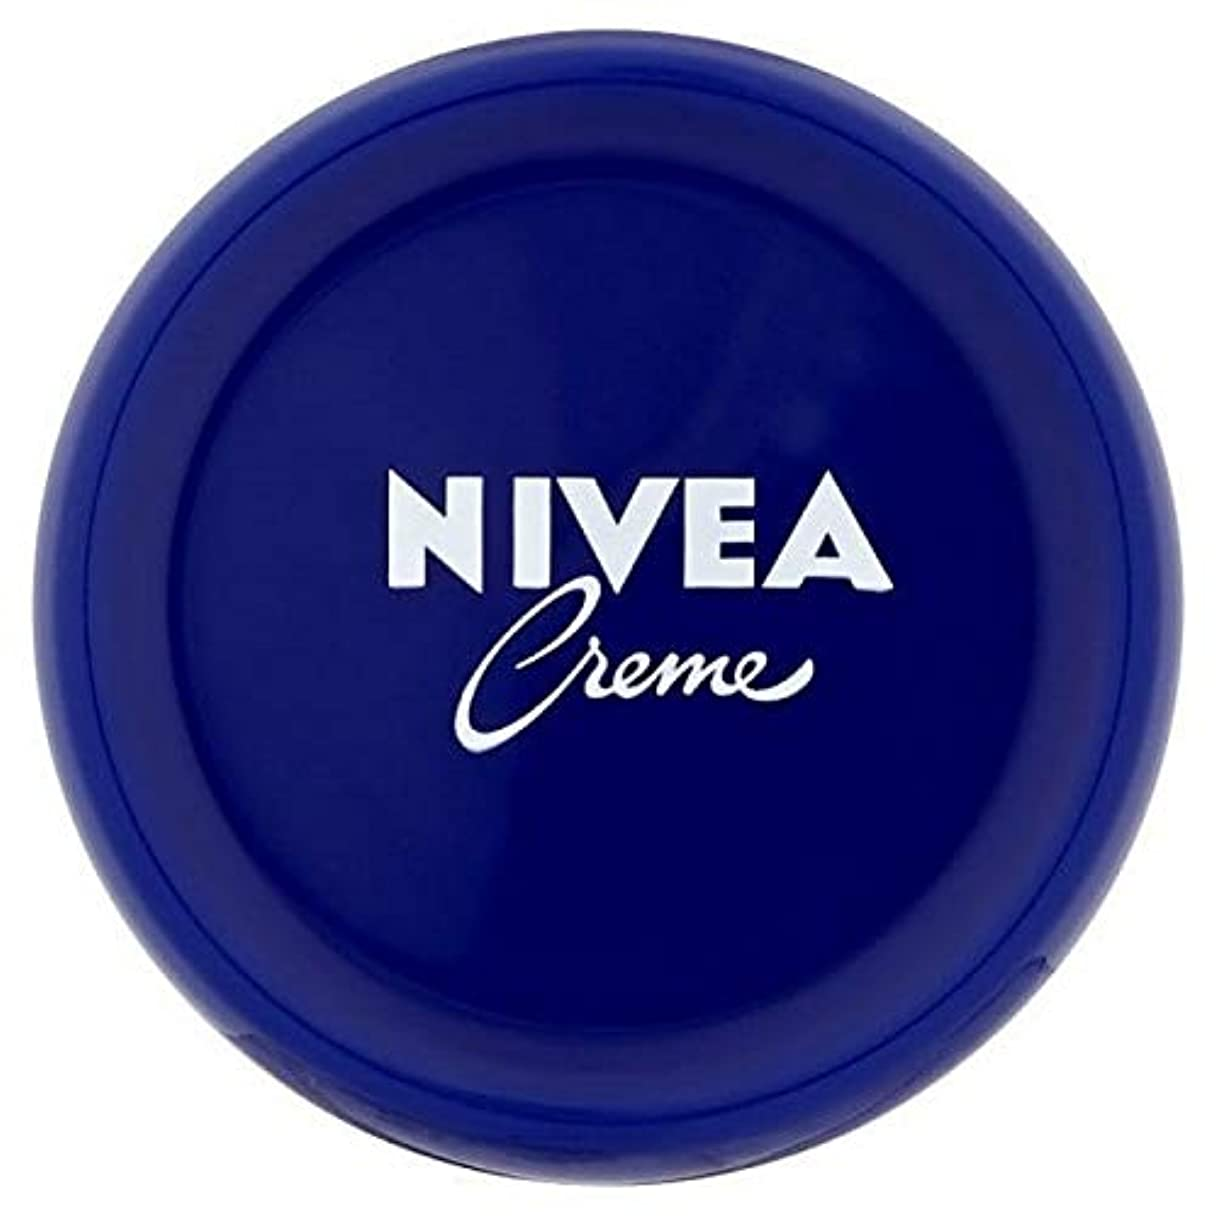 [Nivea ] ニベアクリーム万能ボディクリーム、50ミリリットル - NIVEA Creme All Purpose Body Cream, 50ml [並行輸入品]